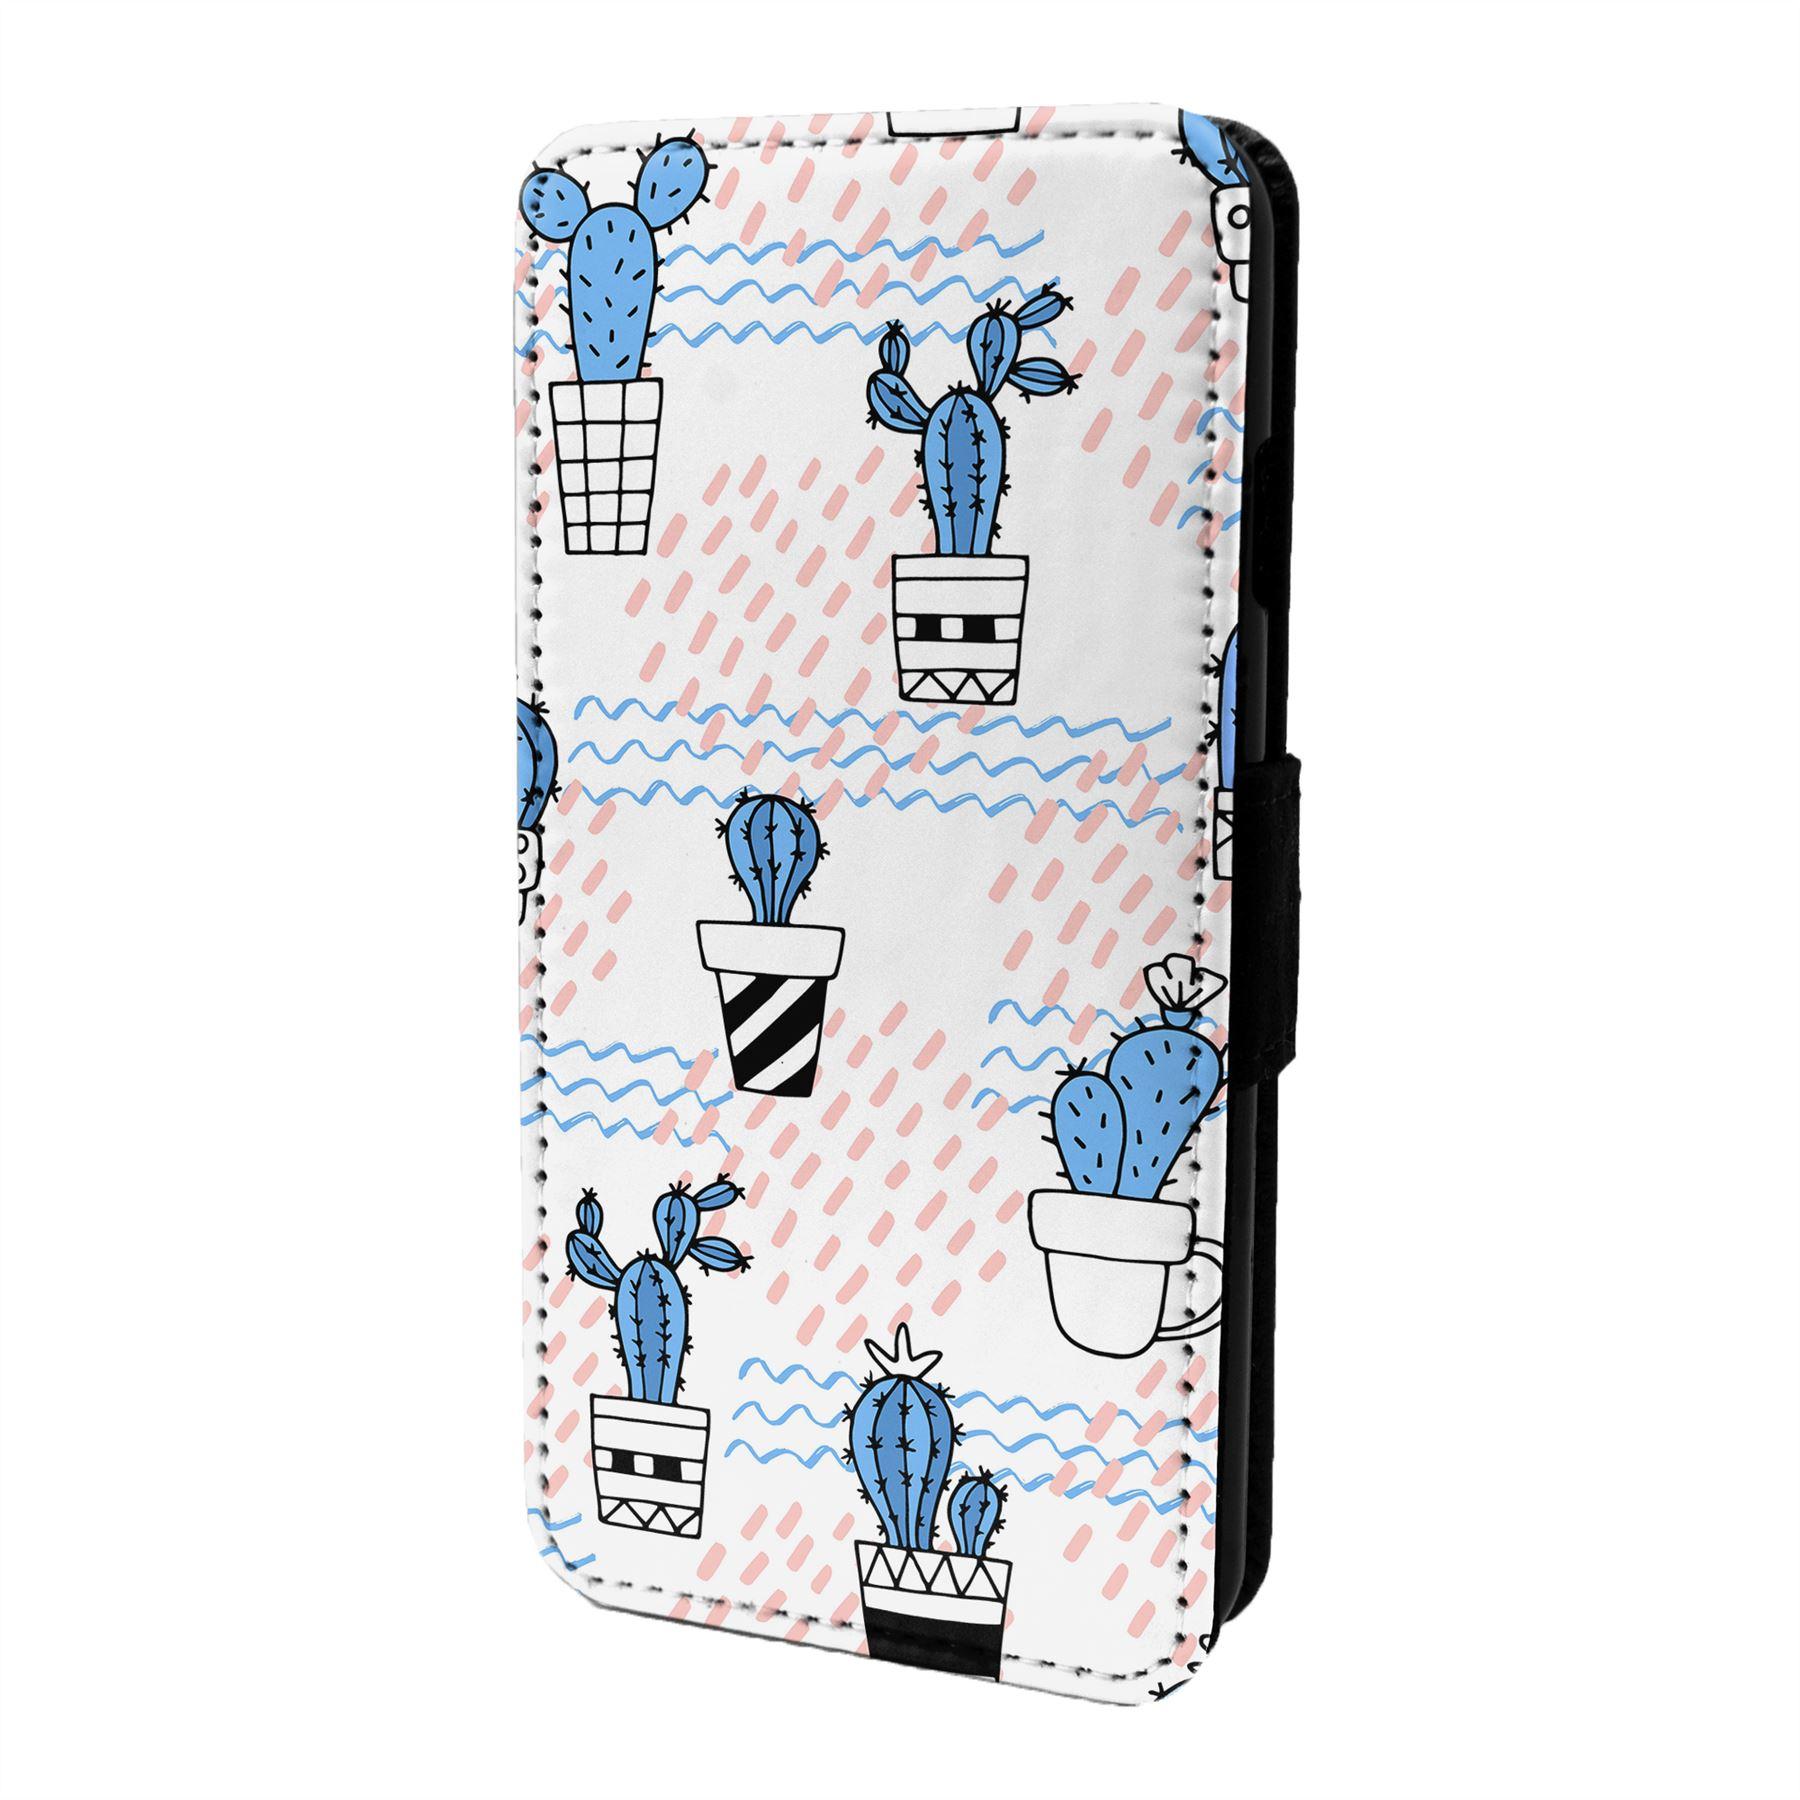 Cactus-Motif-Etui-Rabattable-pour-Telephone-Portable-S6626